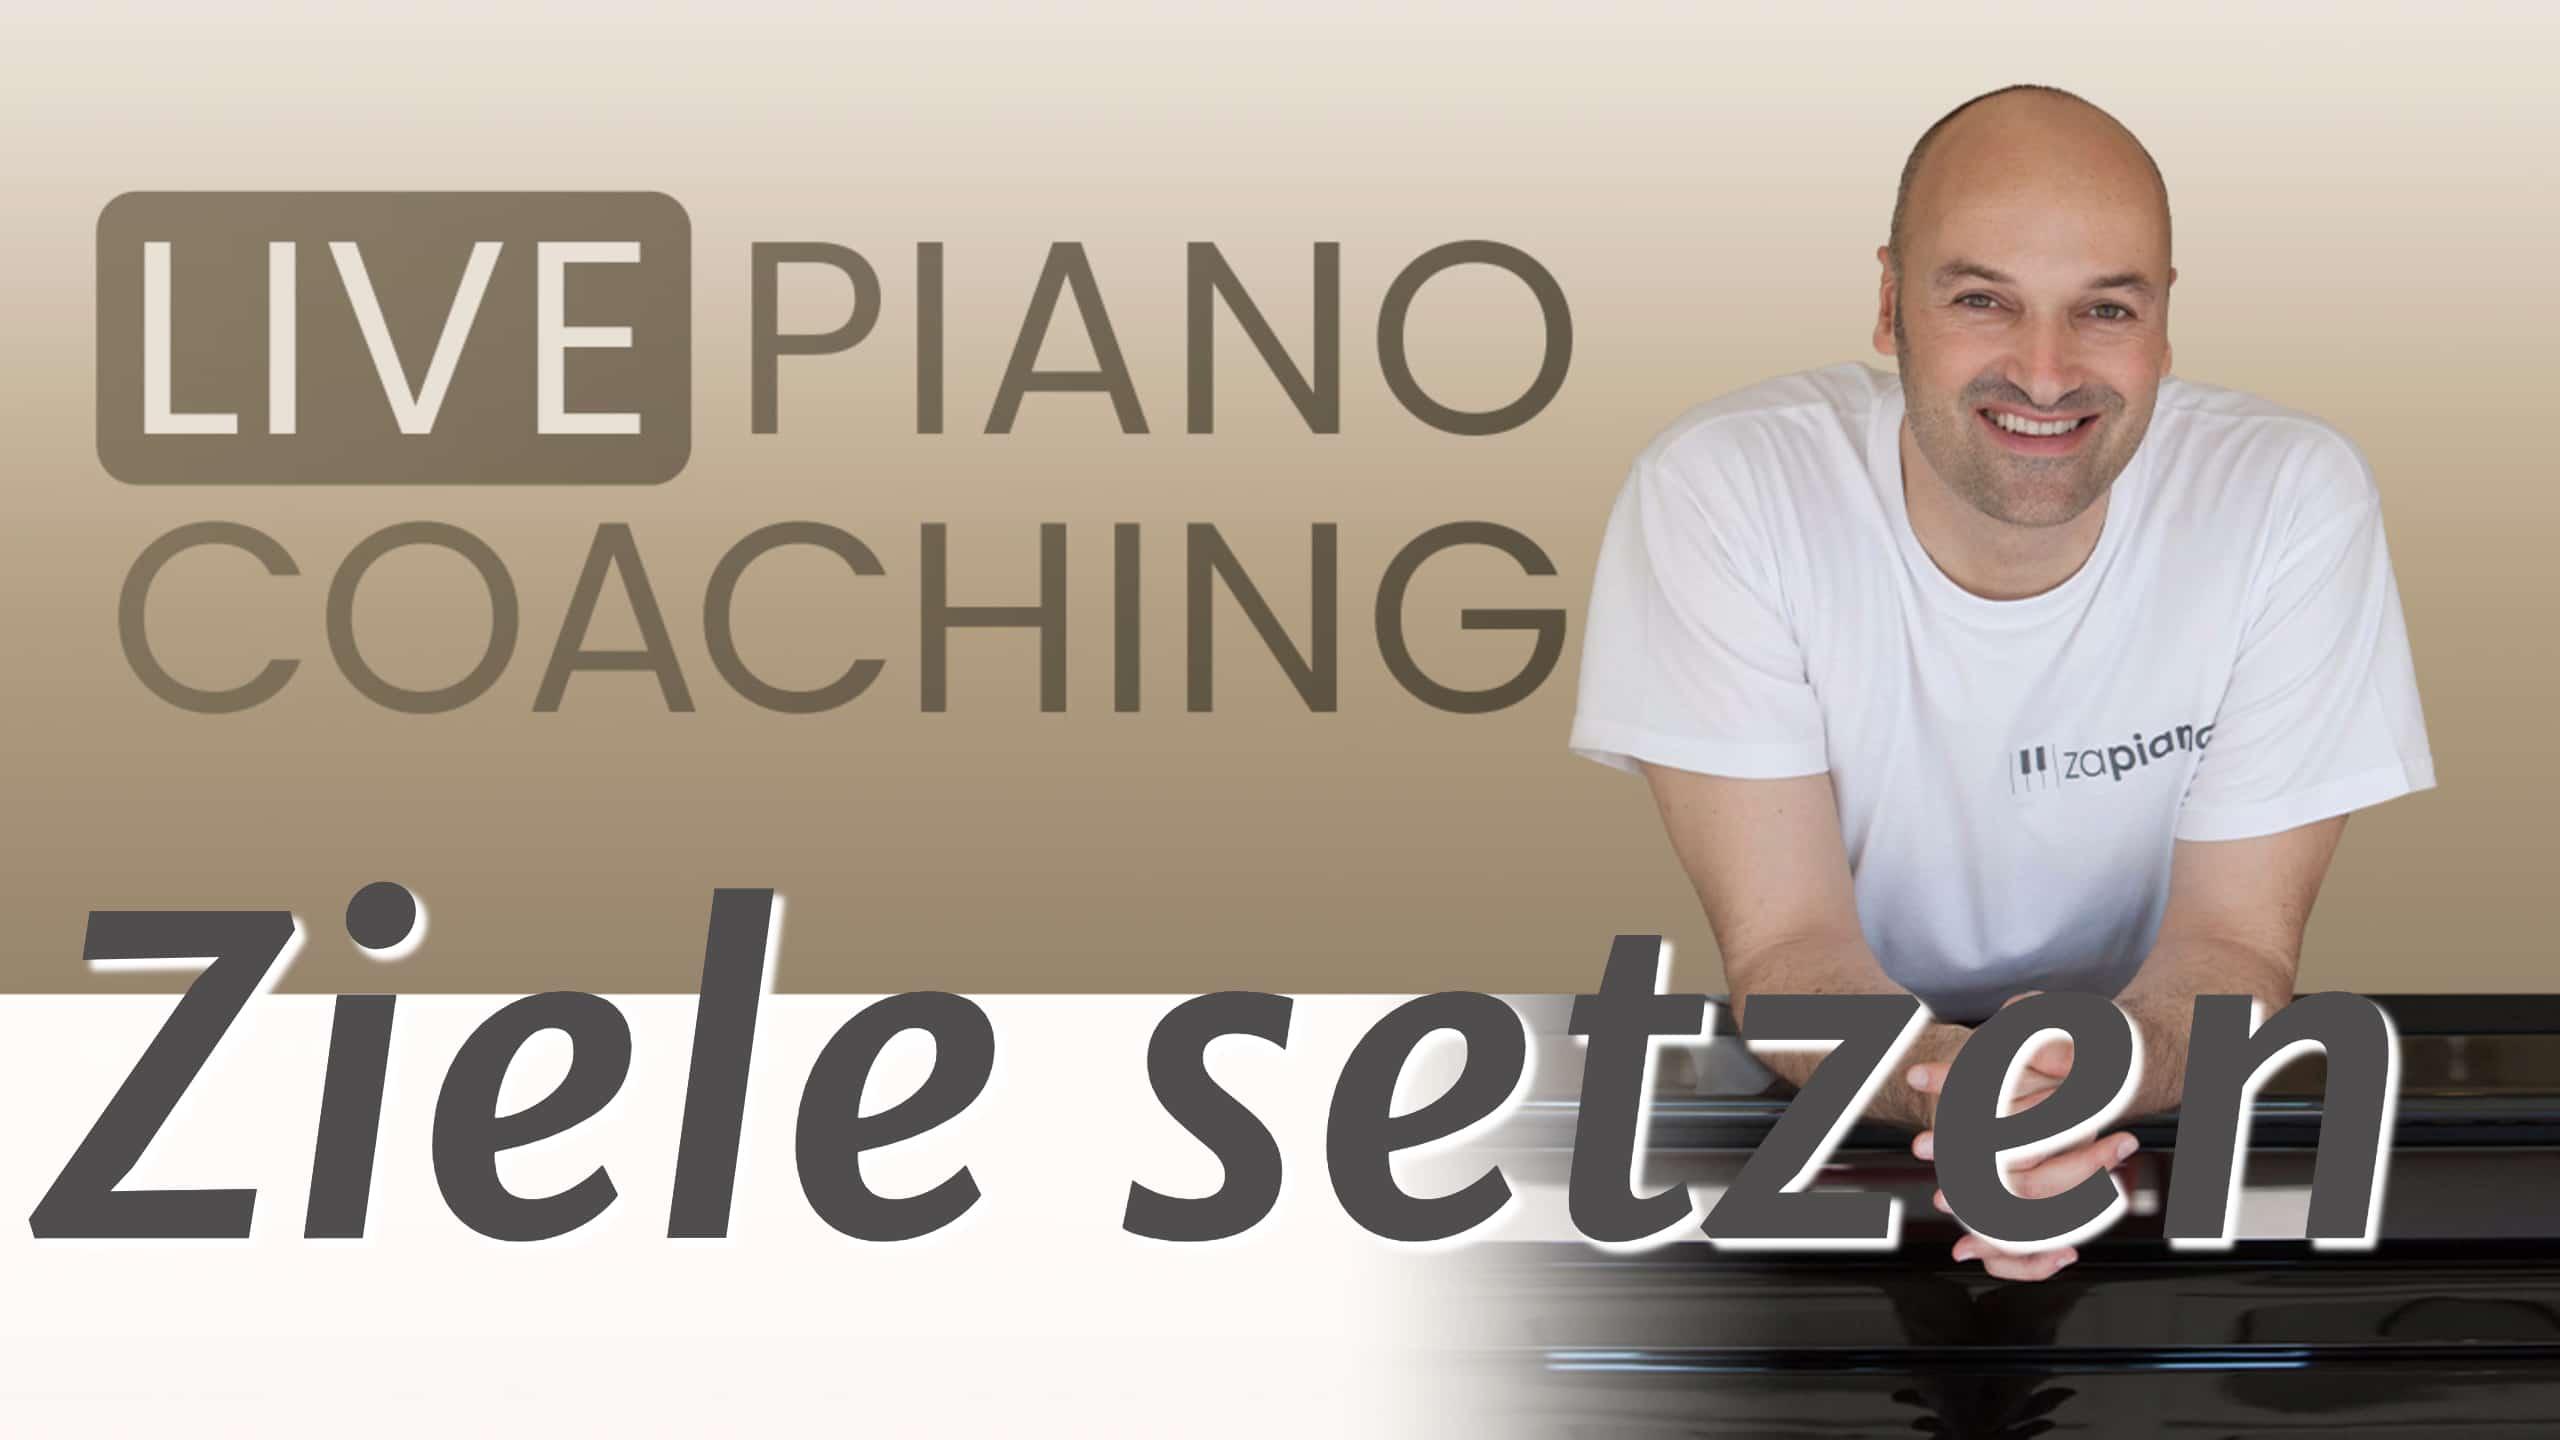 Schau dir unser Live Piano Coaching zum Thema Ziele setzen am Klavier an.